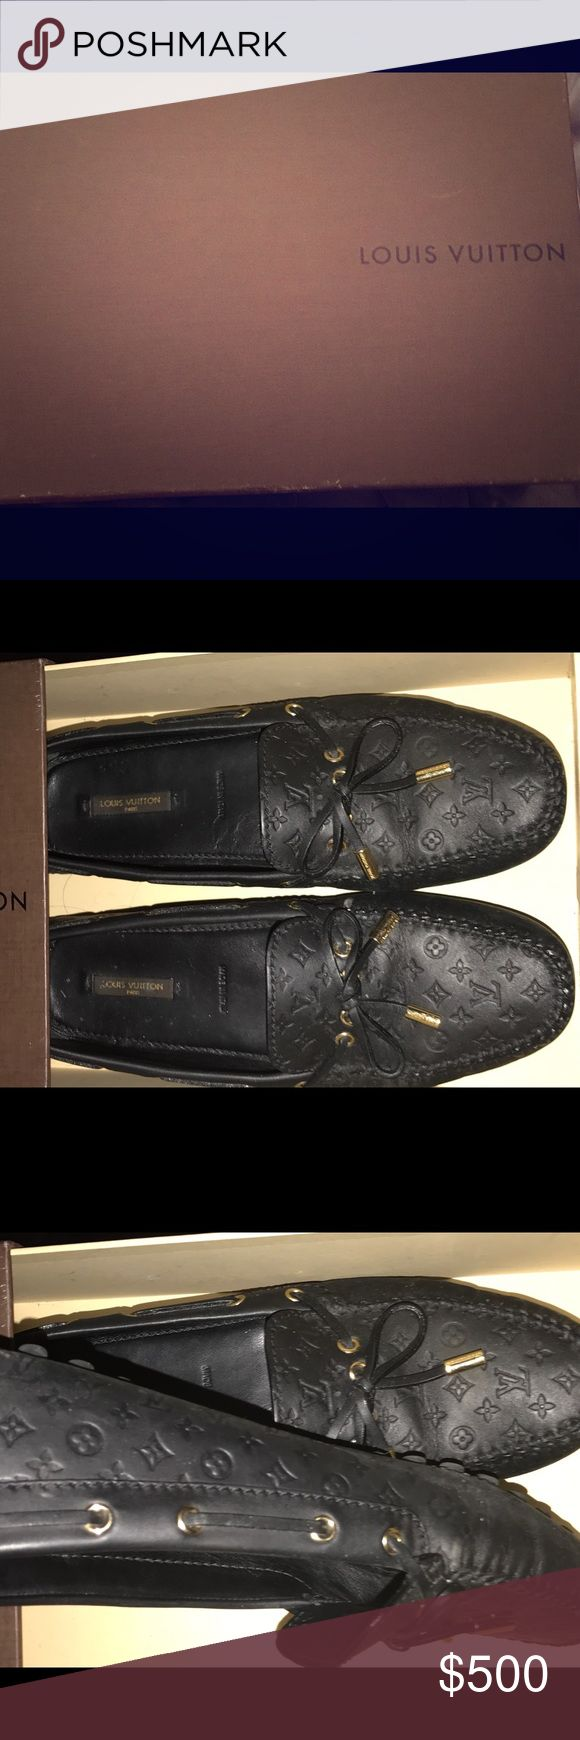 Louis Vuitton 100% authentic leather loafers Louis Vuitton 100% authentic leather loafers (worn a few times) Louis Vuitton Shoes Flats & Loafers